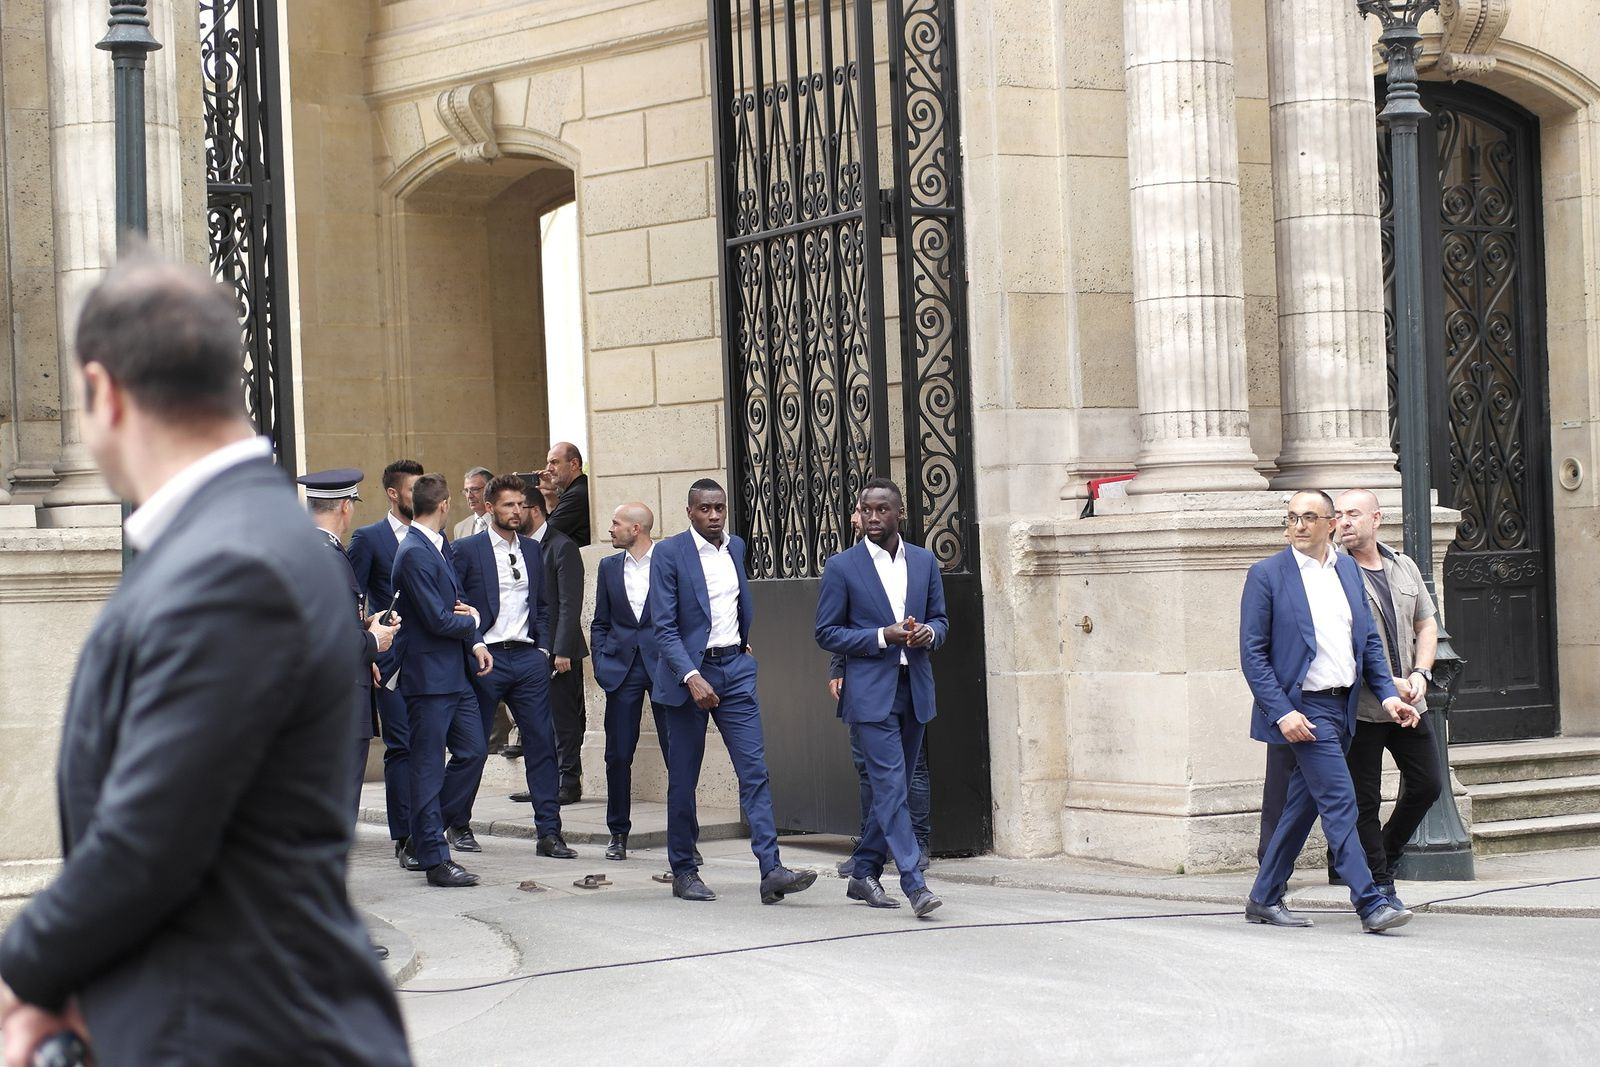 Benoit Costil, Christophe Jallet, Blaise Matuidi, Bacary Sagna